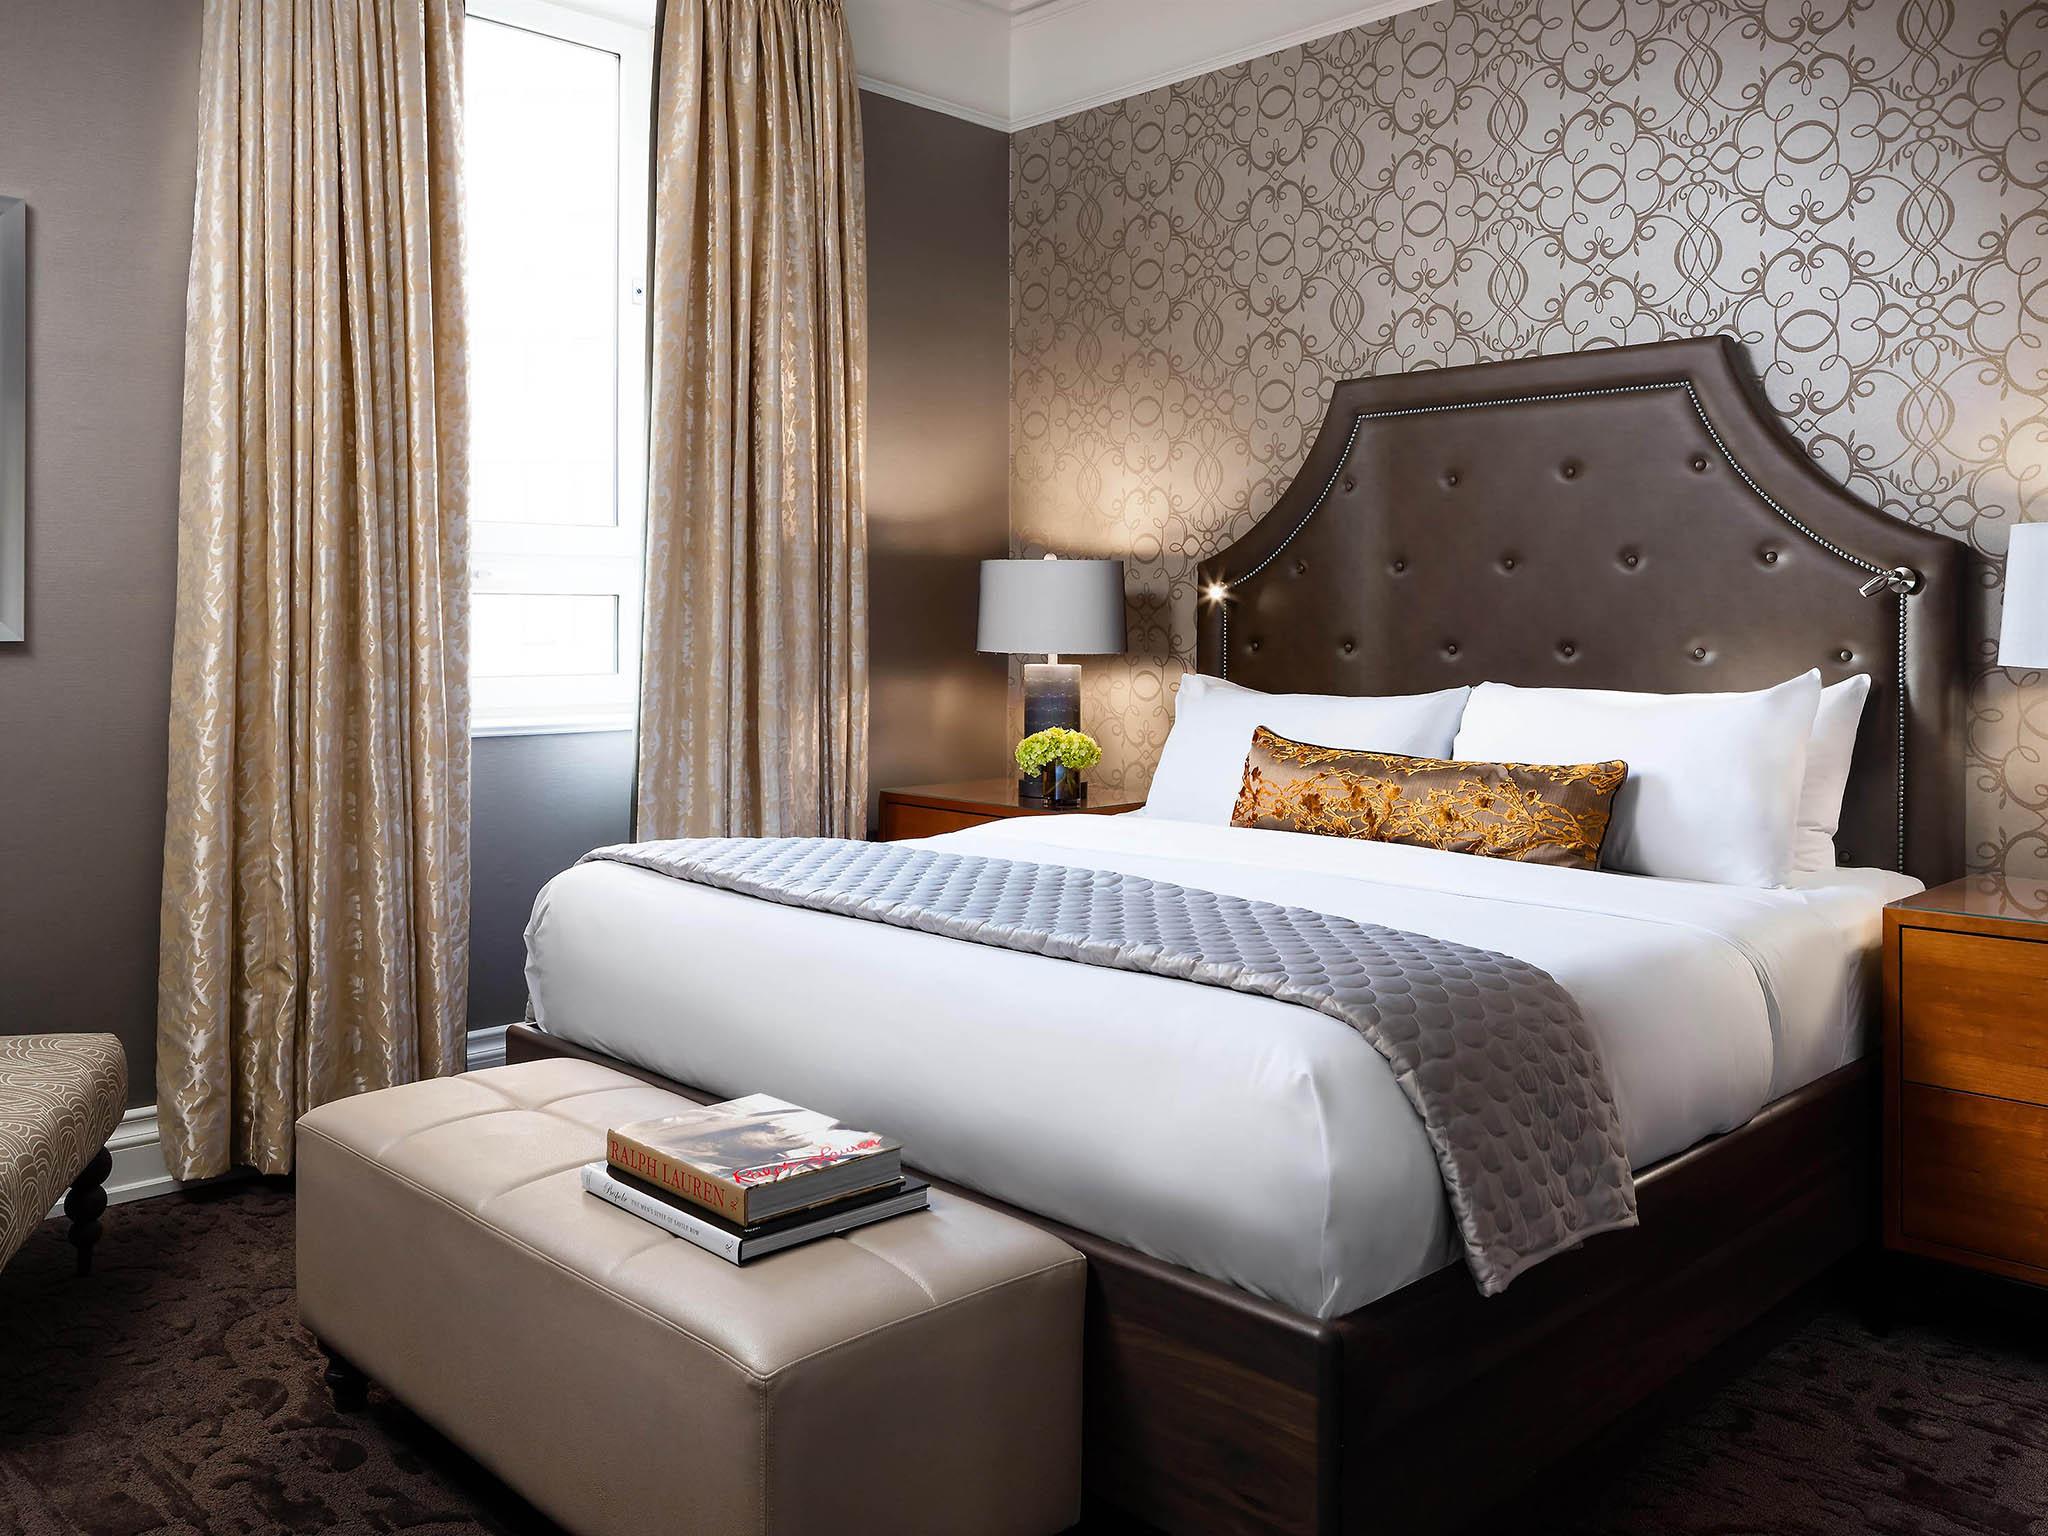 Hotel in CALGARY - Fairmont Palliser